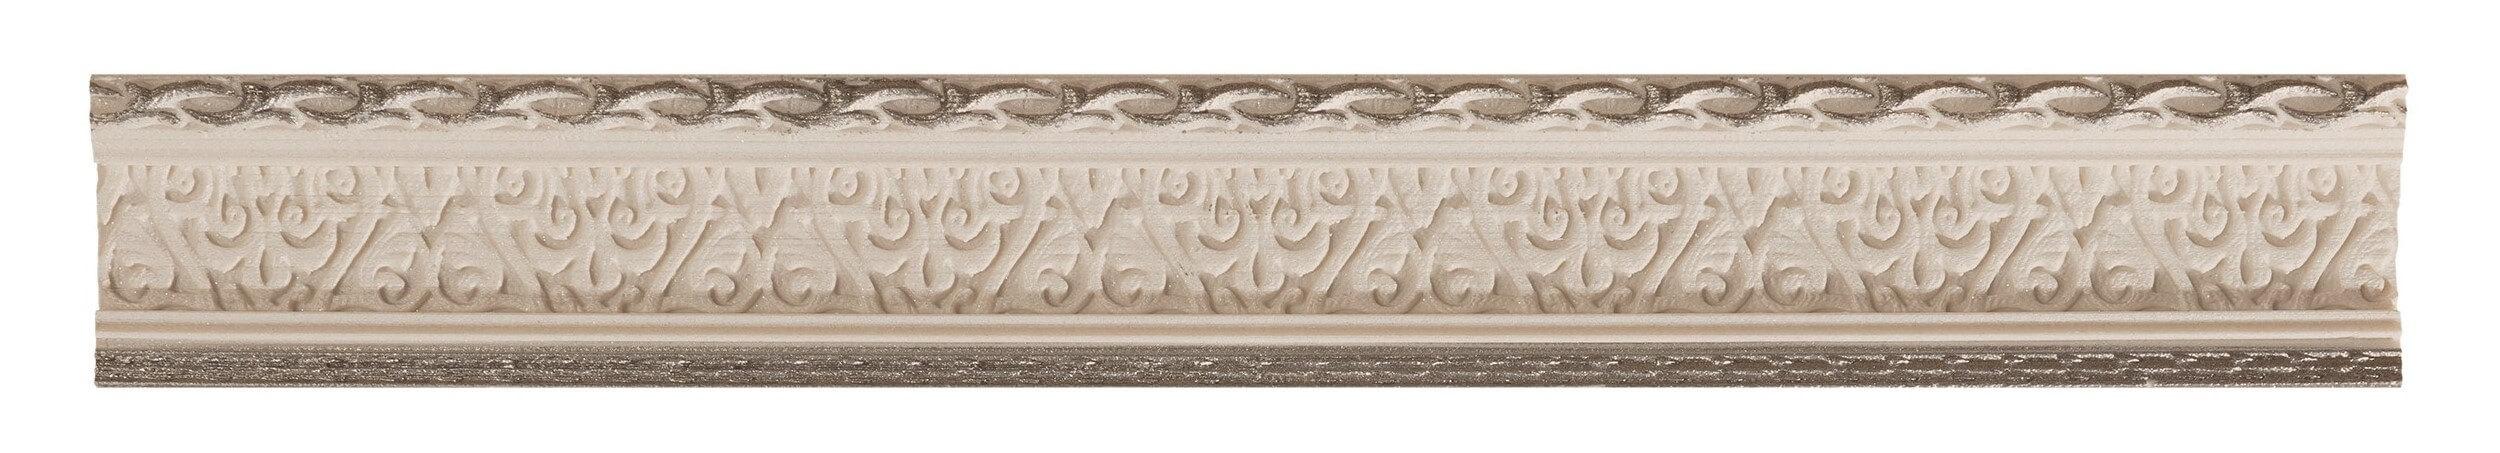 Бордюр Azulev Mold Delice Marfil 4x29